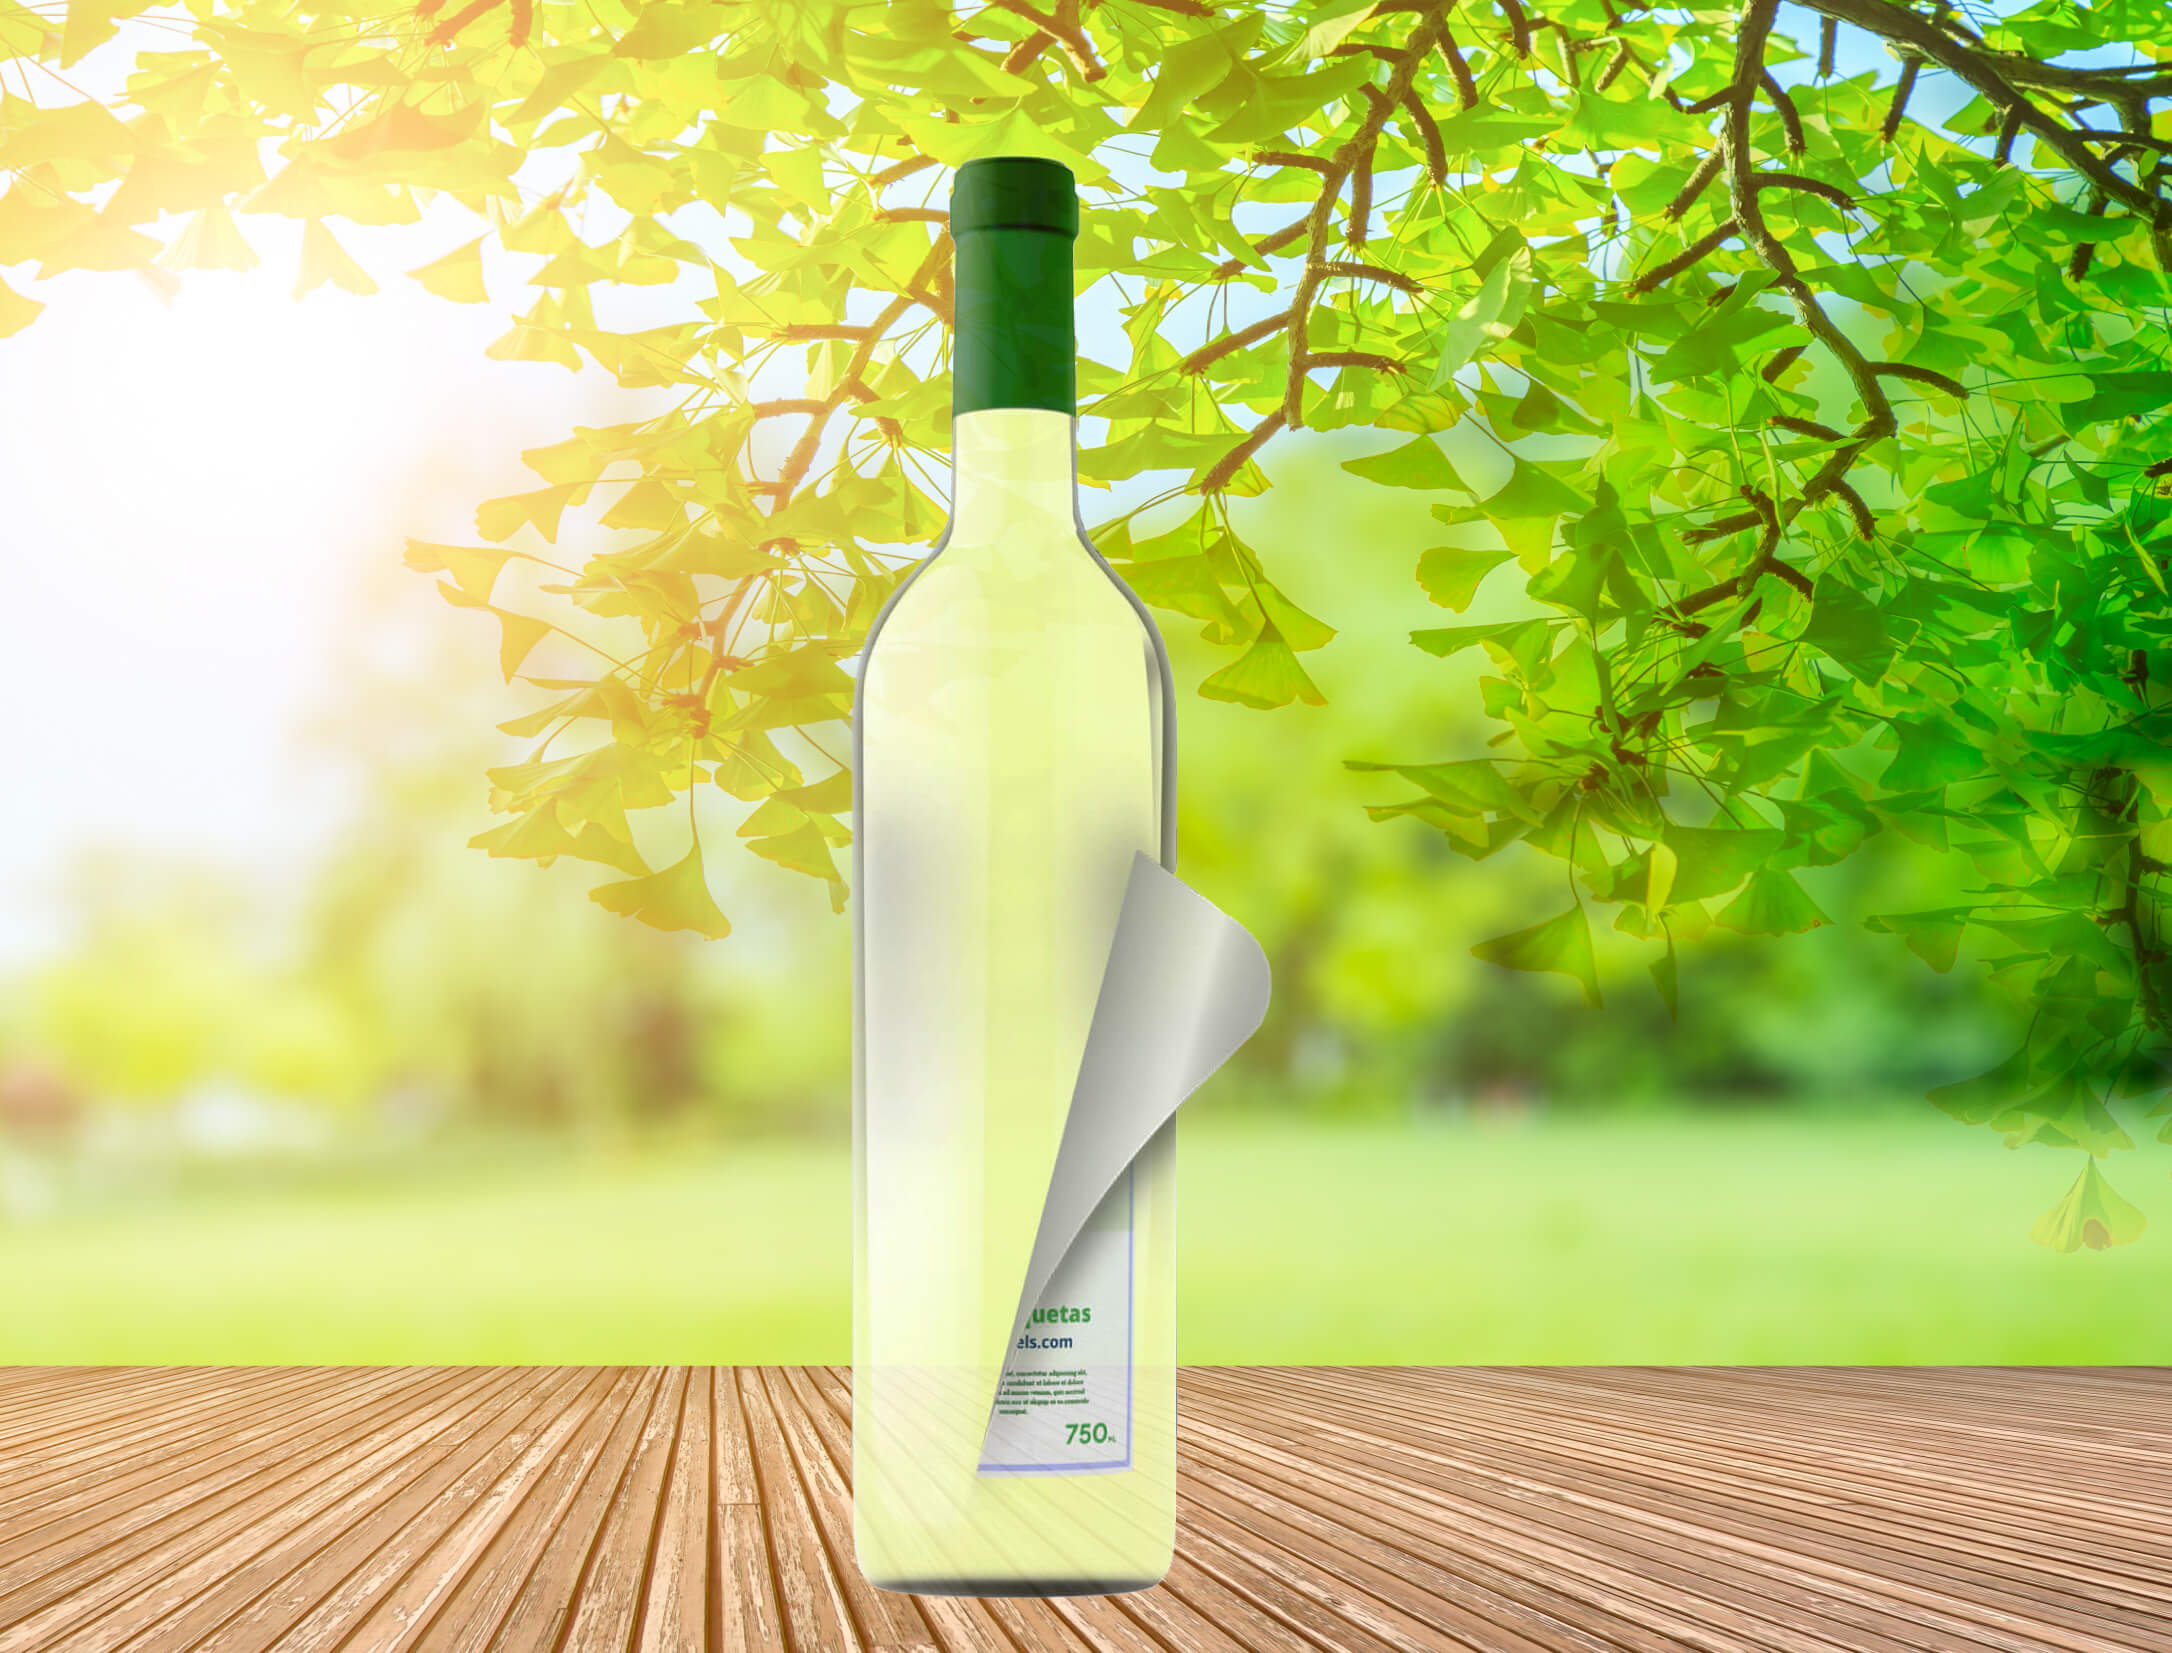 etiquetas-ecologicas-ecoetiquetas-para-vinos-cavas